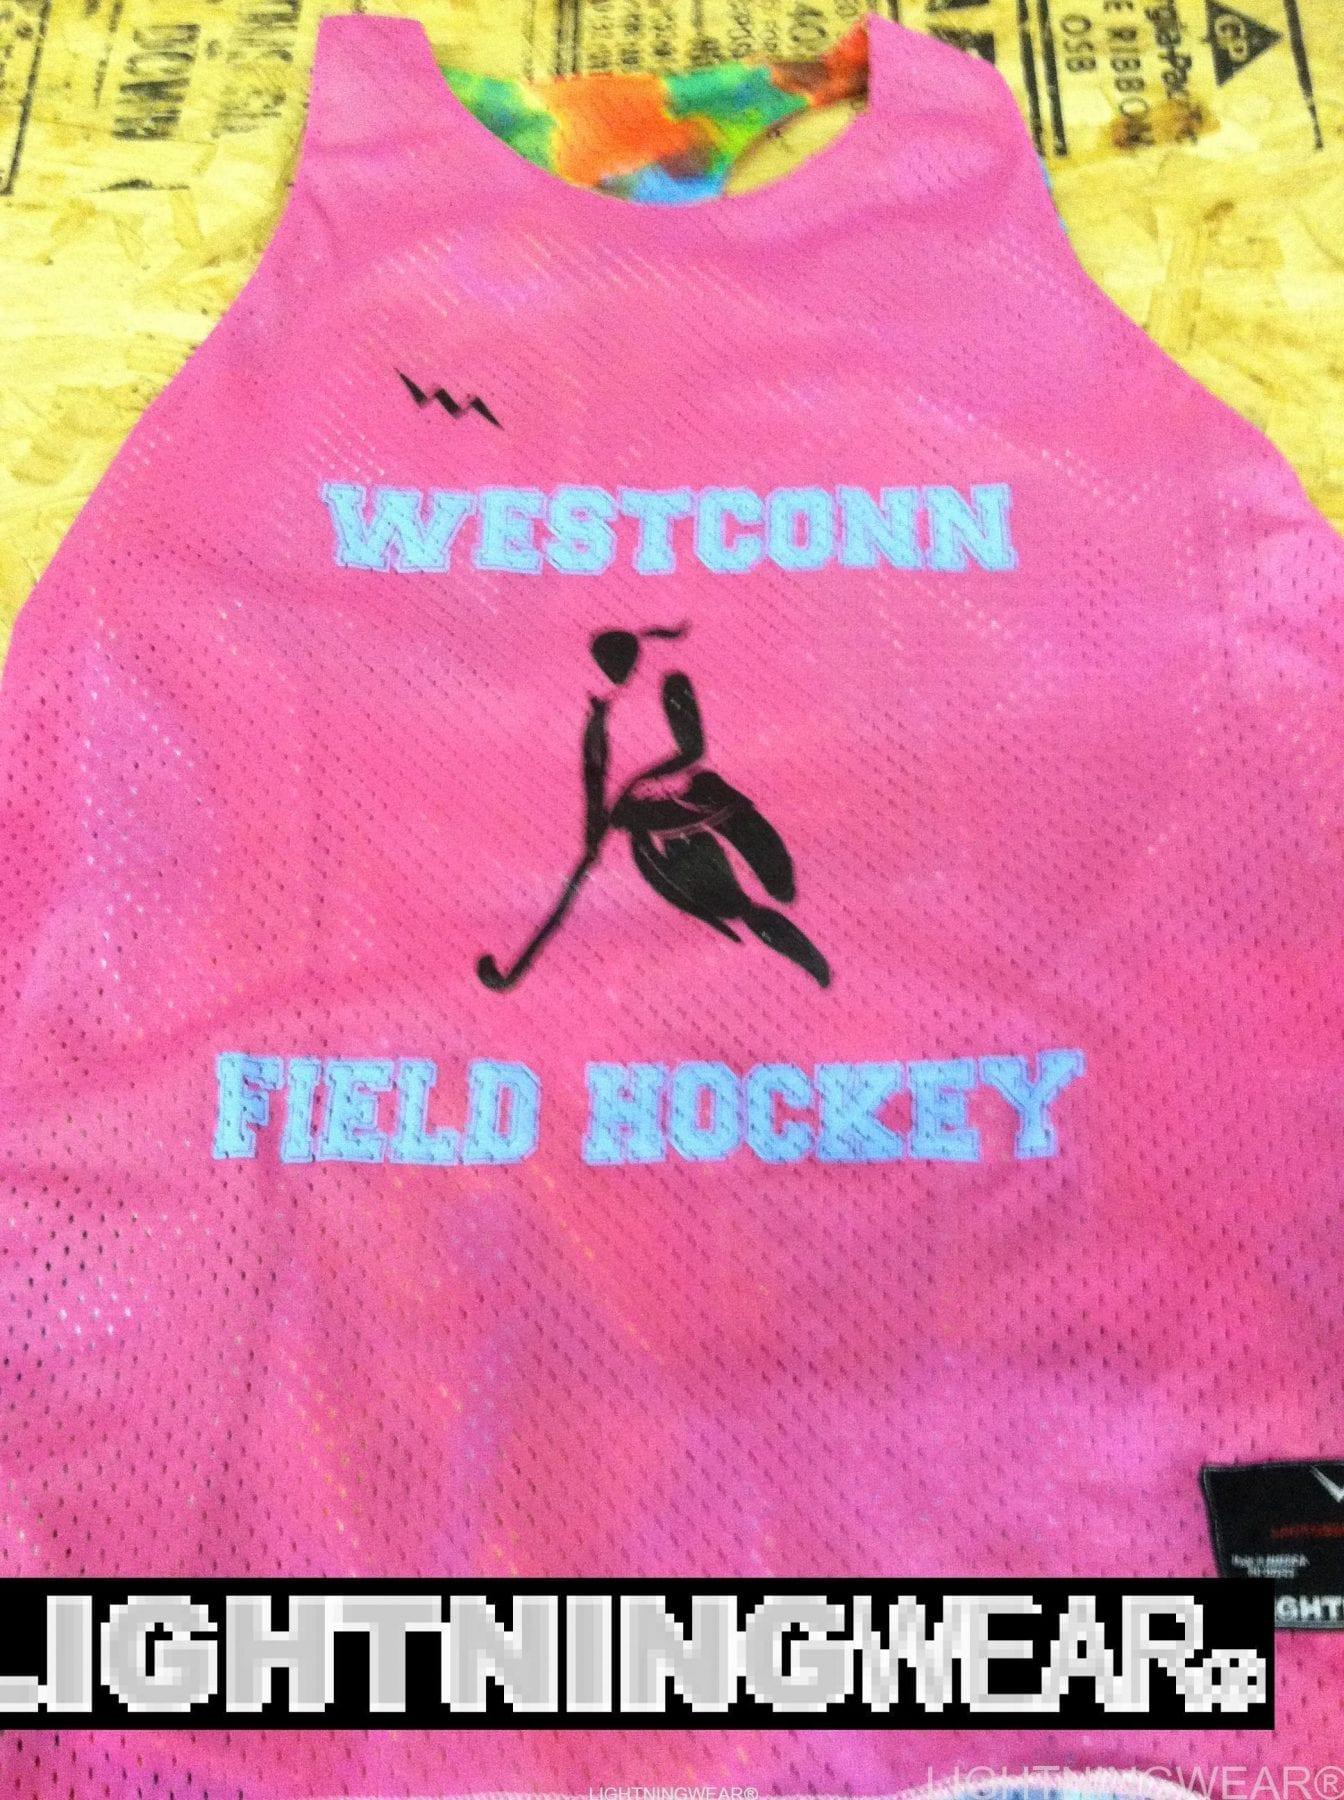 westconn field hockey pinnies racerback